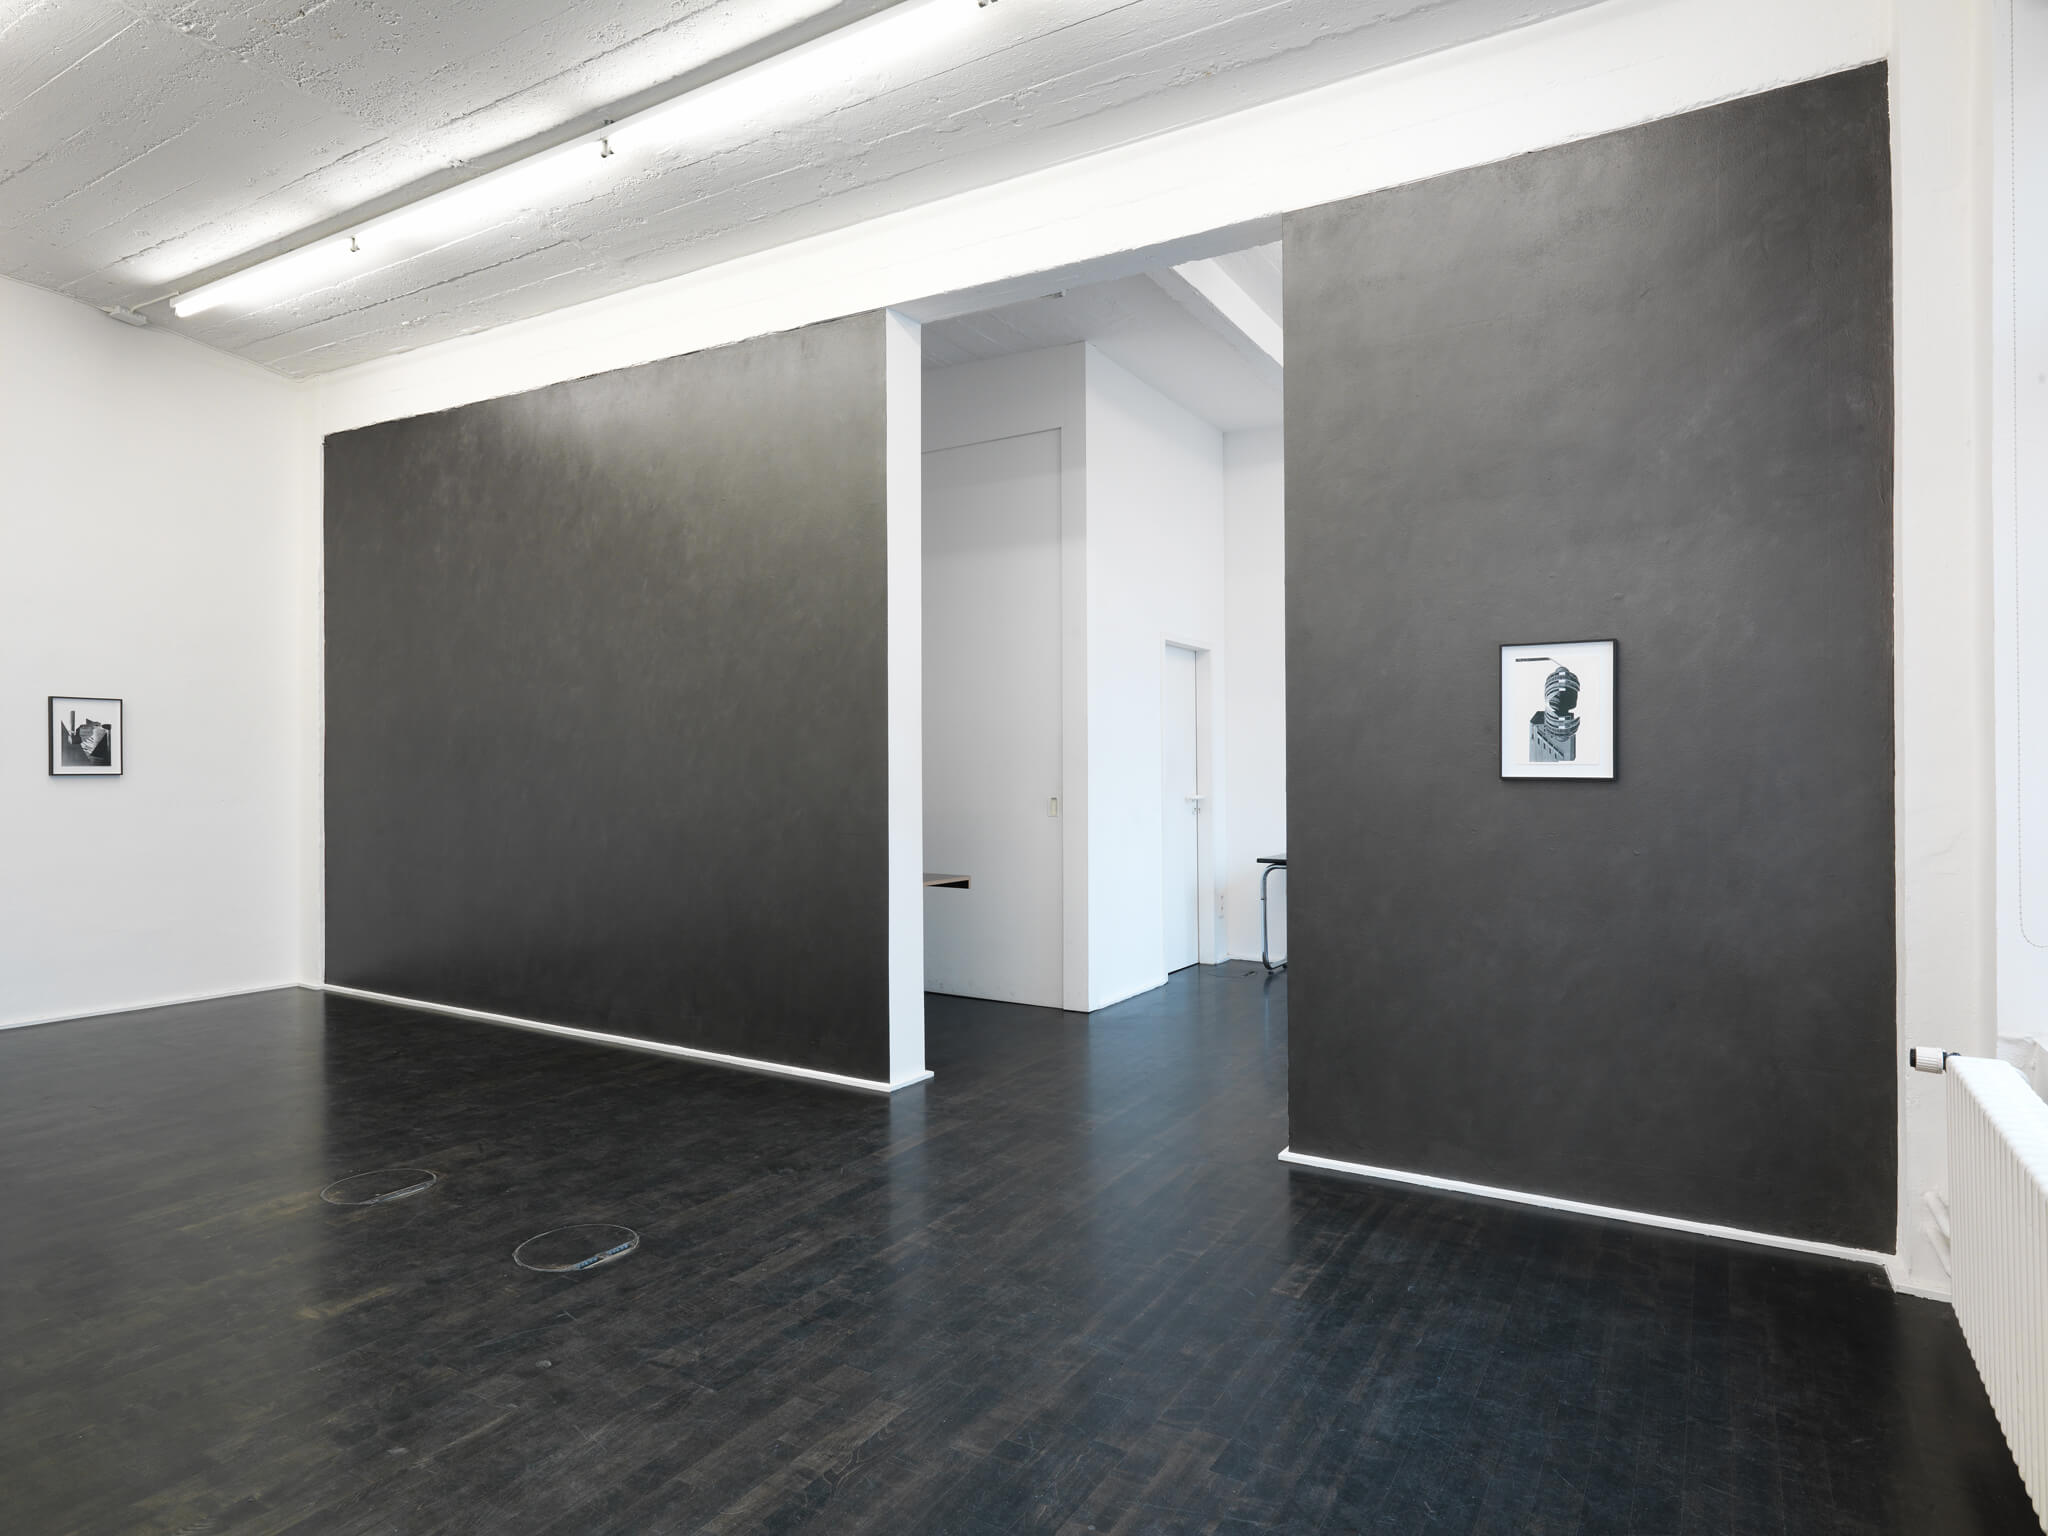 58_Frauke-Dannert_Installation_displaced_2015_Galerie-Rupert-Pfab,-Düsseldorf